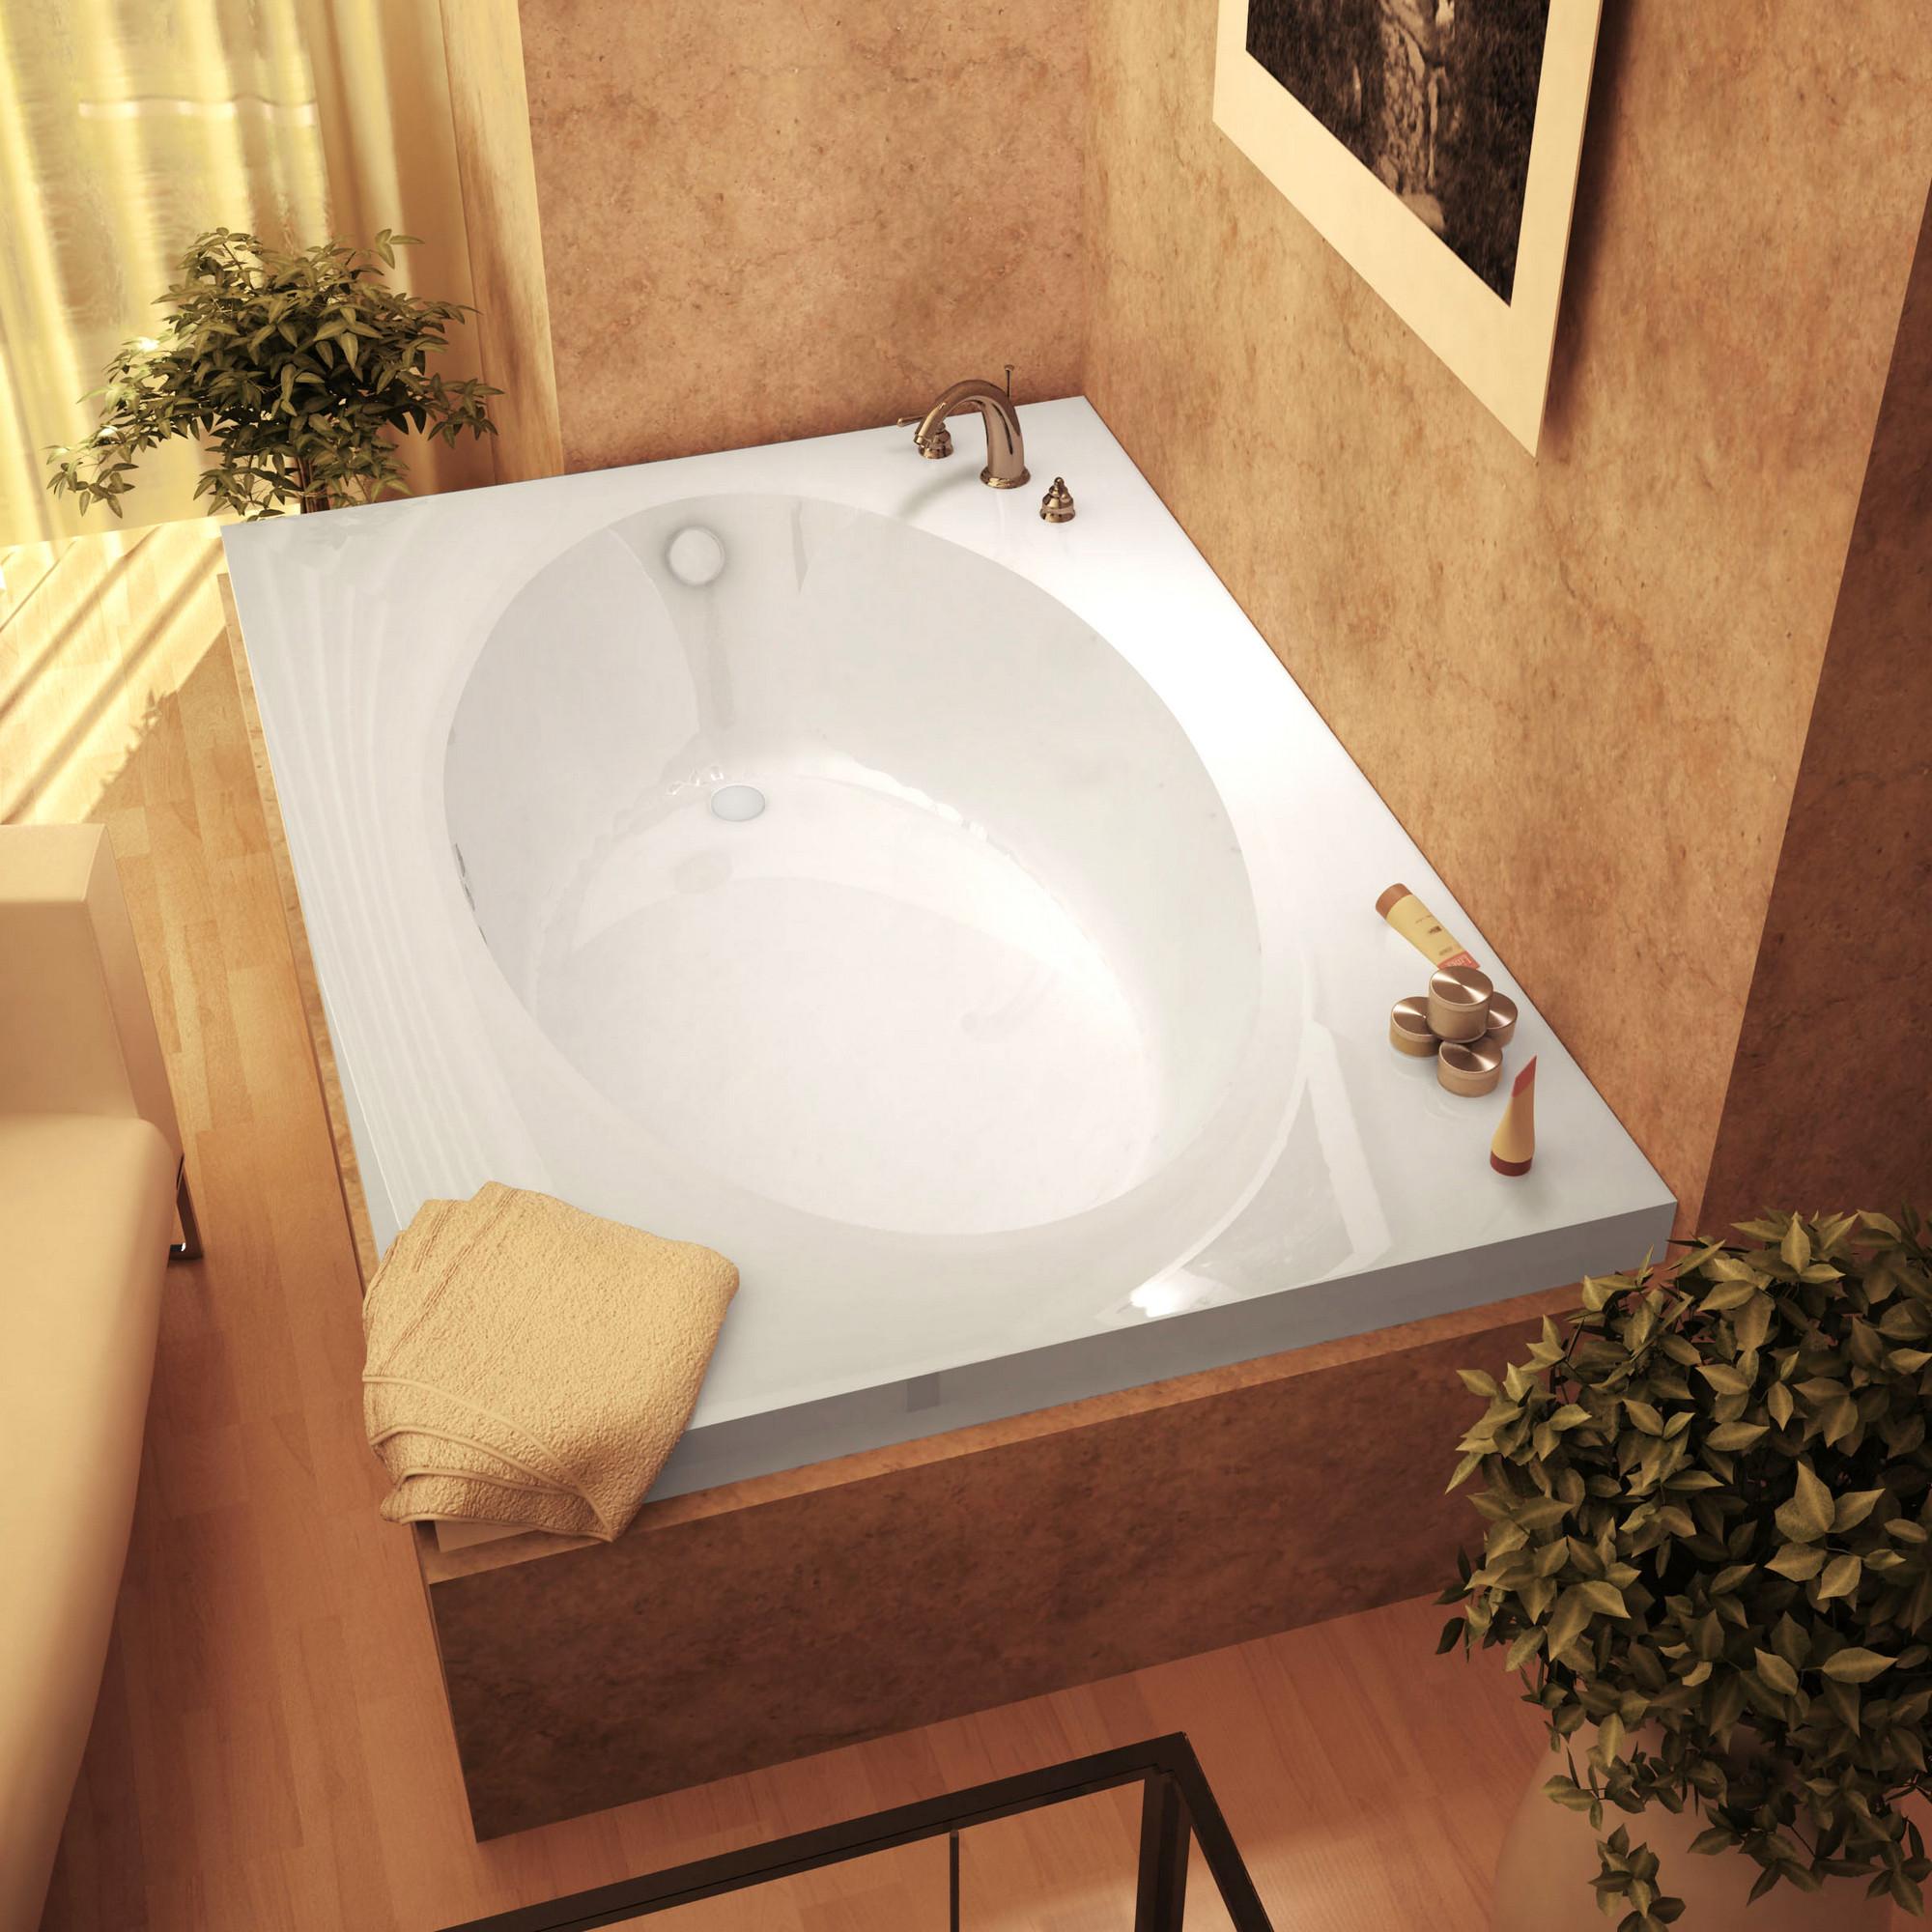 MediTub 4384V Atlantis Vogue Acrylic Soaking Tub With Reversible Drain